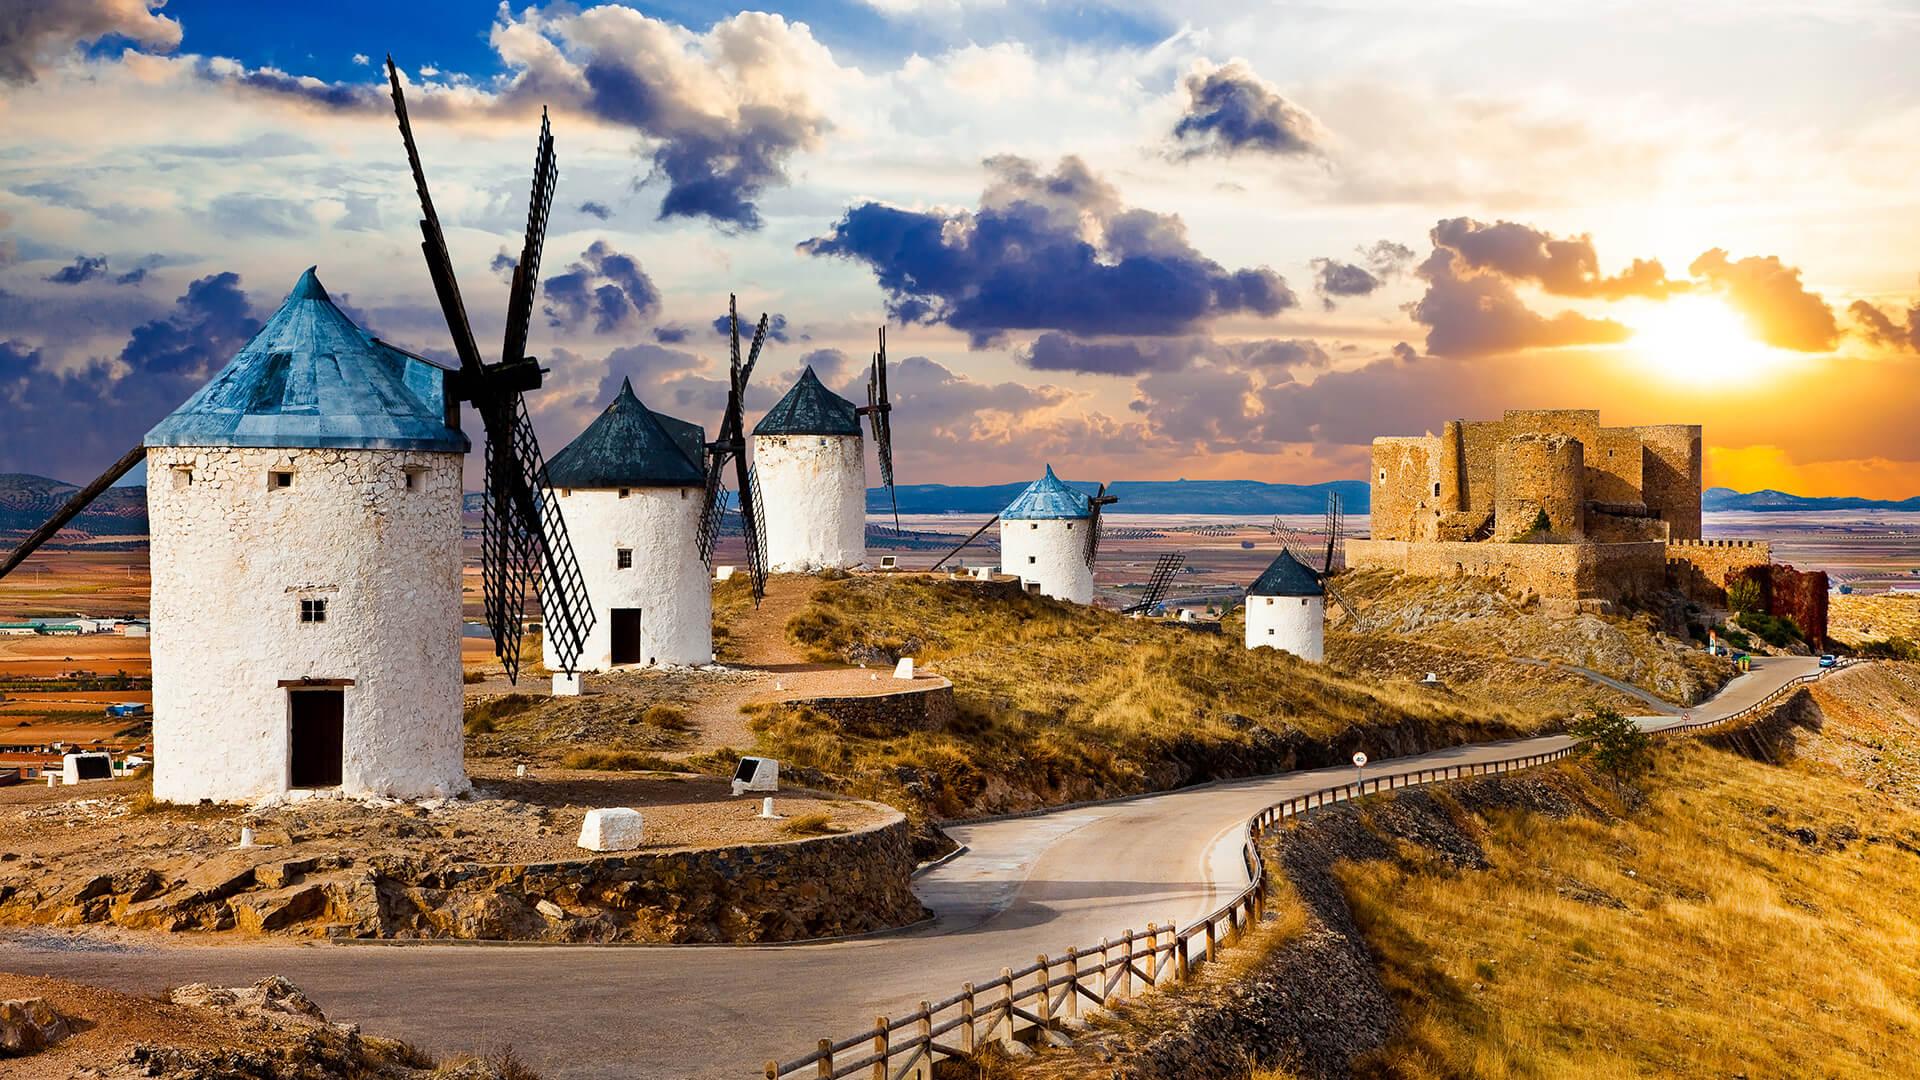 Castilla la Mancha-Don Quijote,Toledo,Cuenca | Spainally. B2B